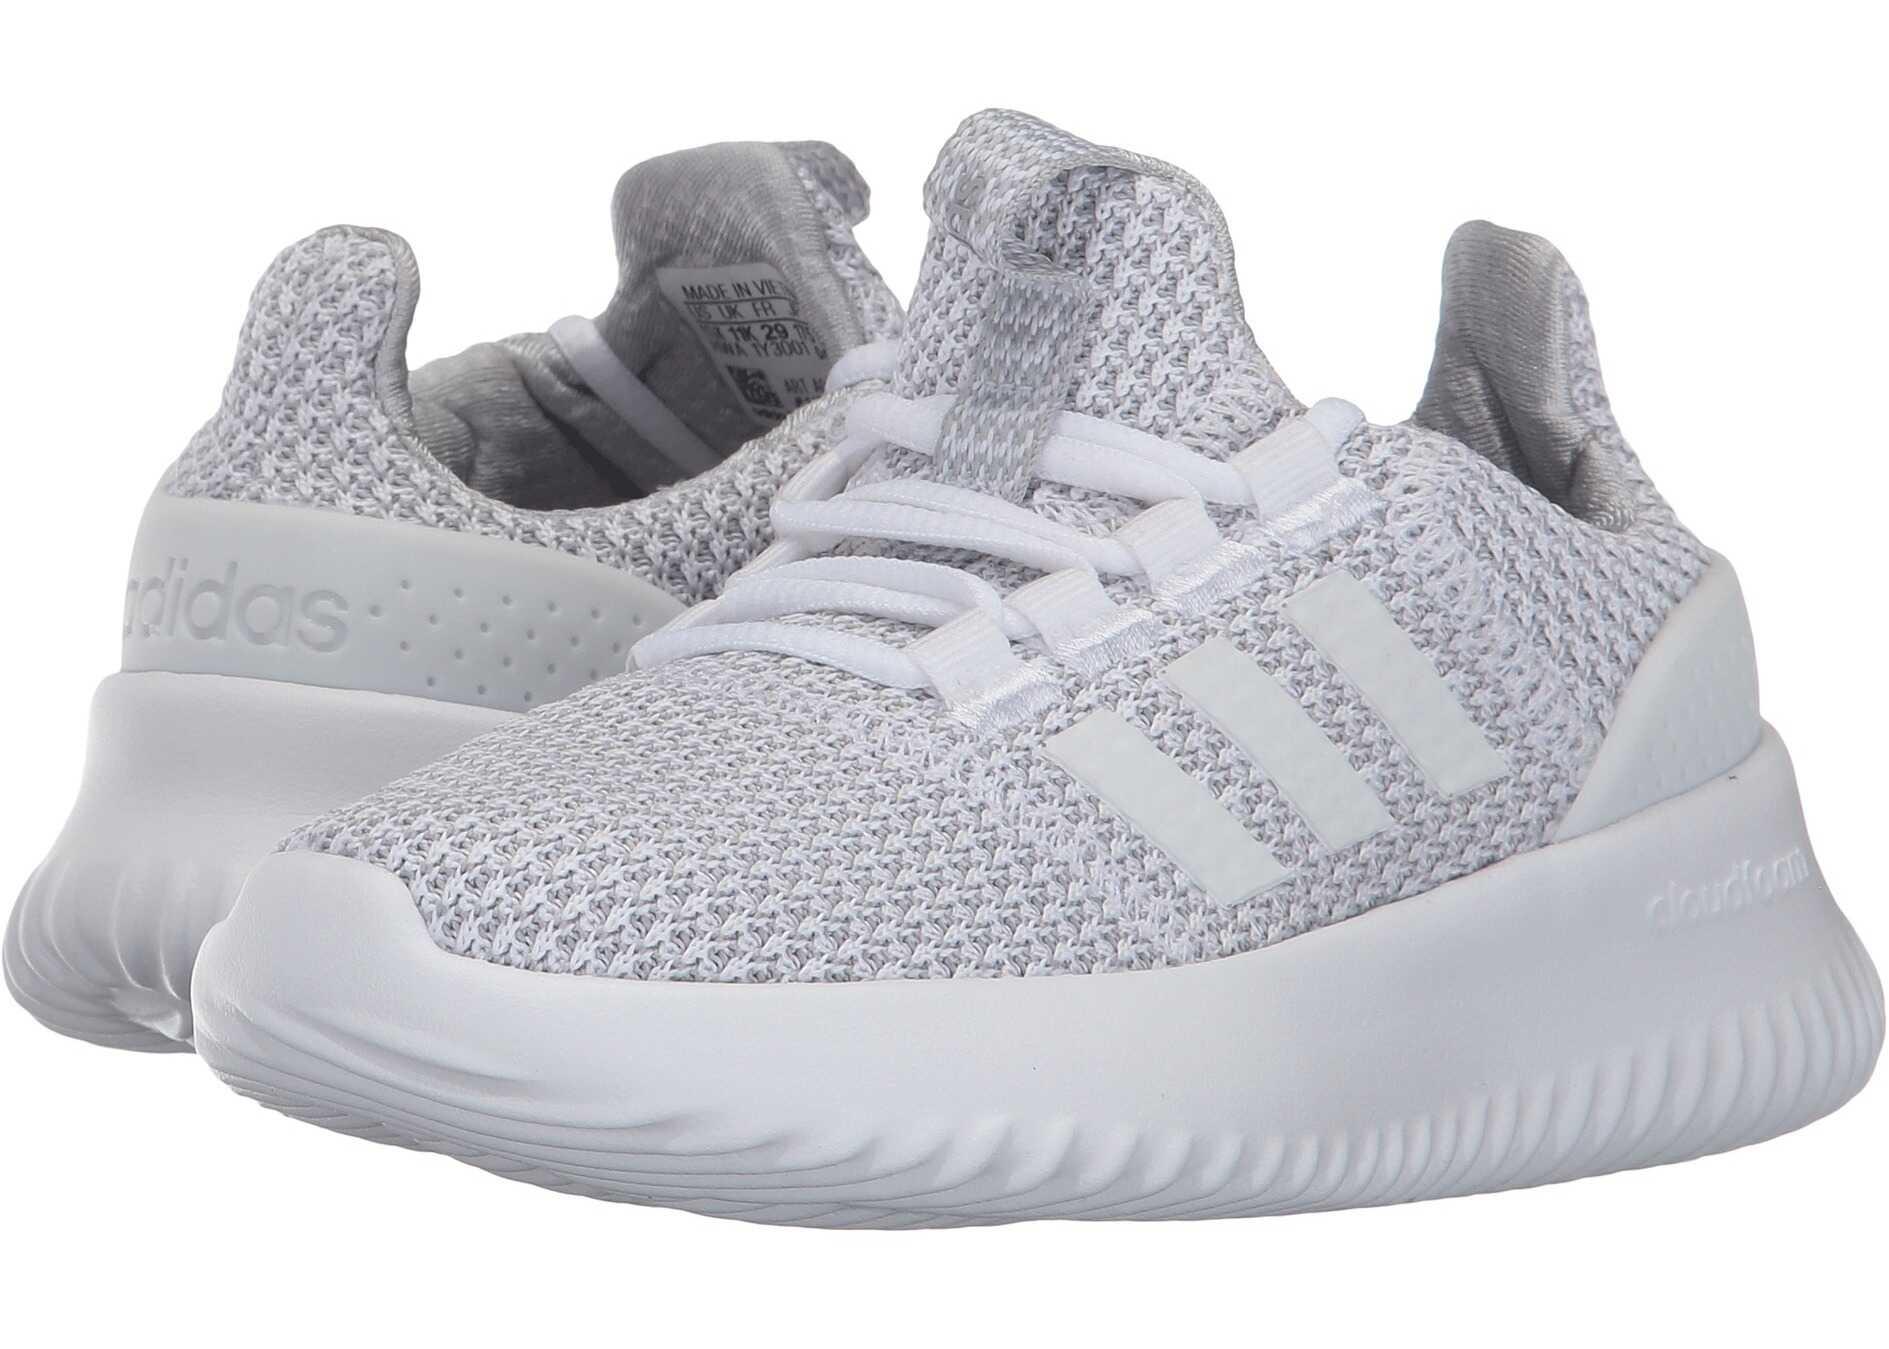 adidas Kids Cloudfoam Ultimate (Little Kid/Big Kid) Footwear White/Footwear White/Grey Two